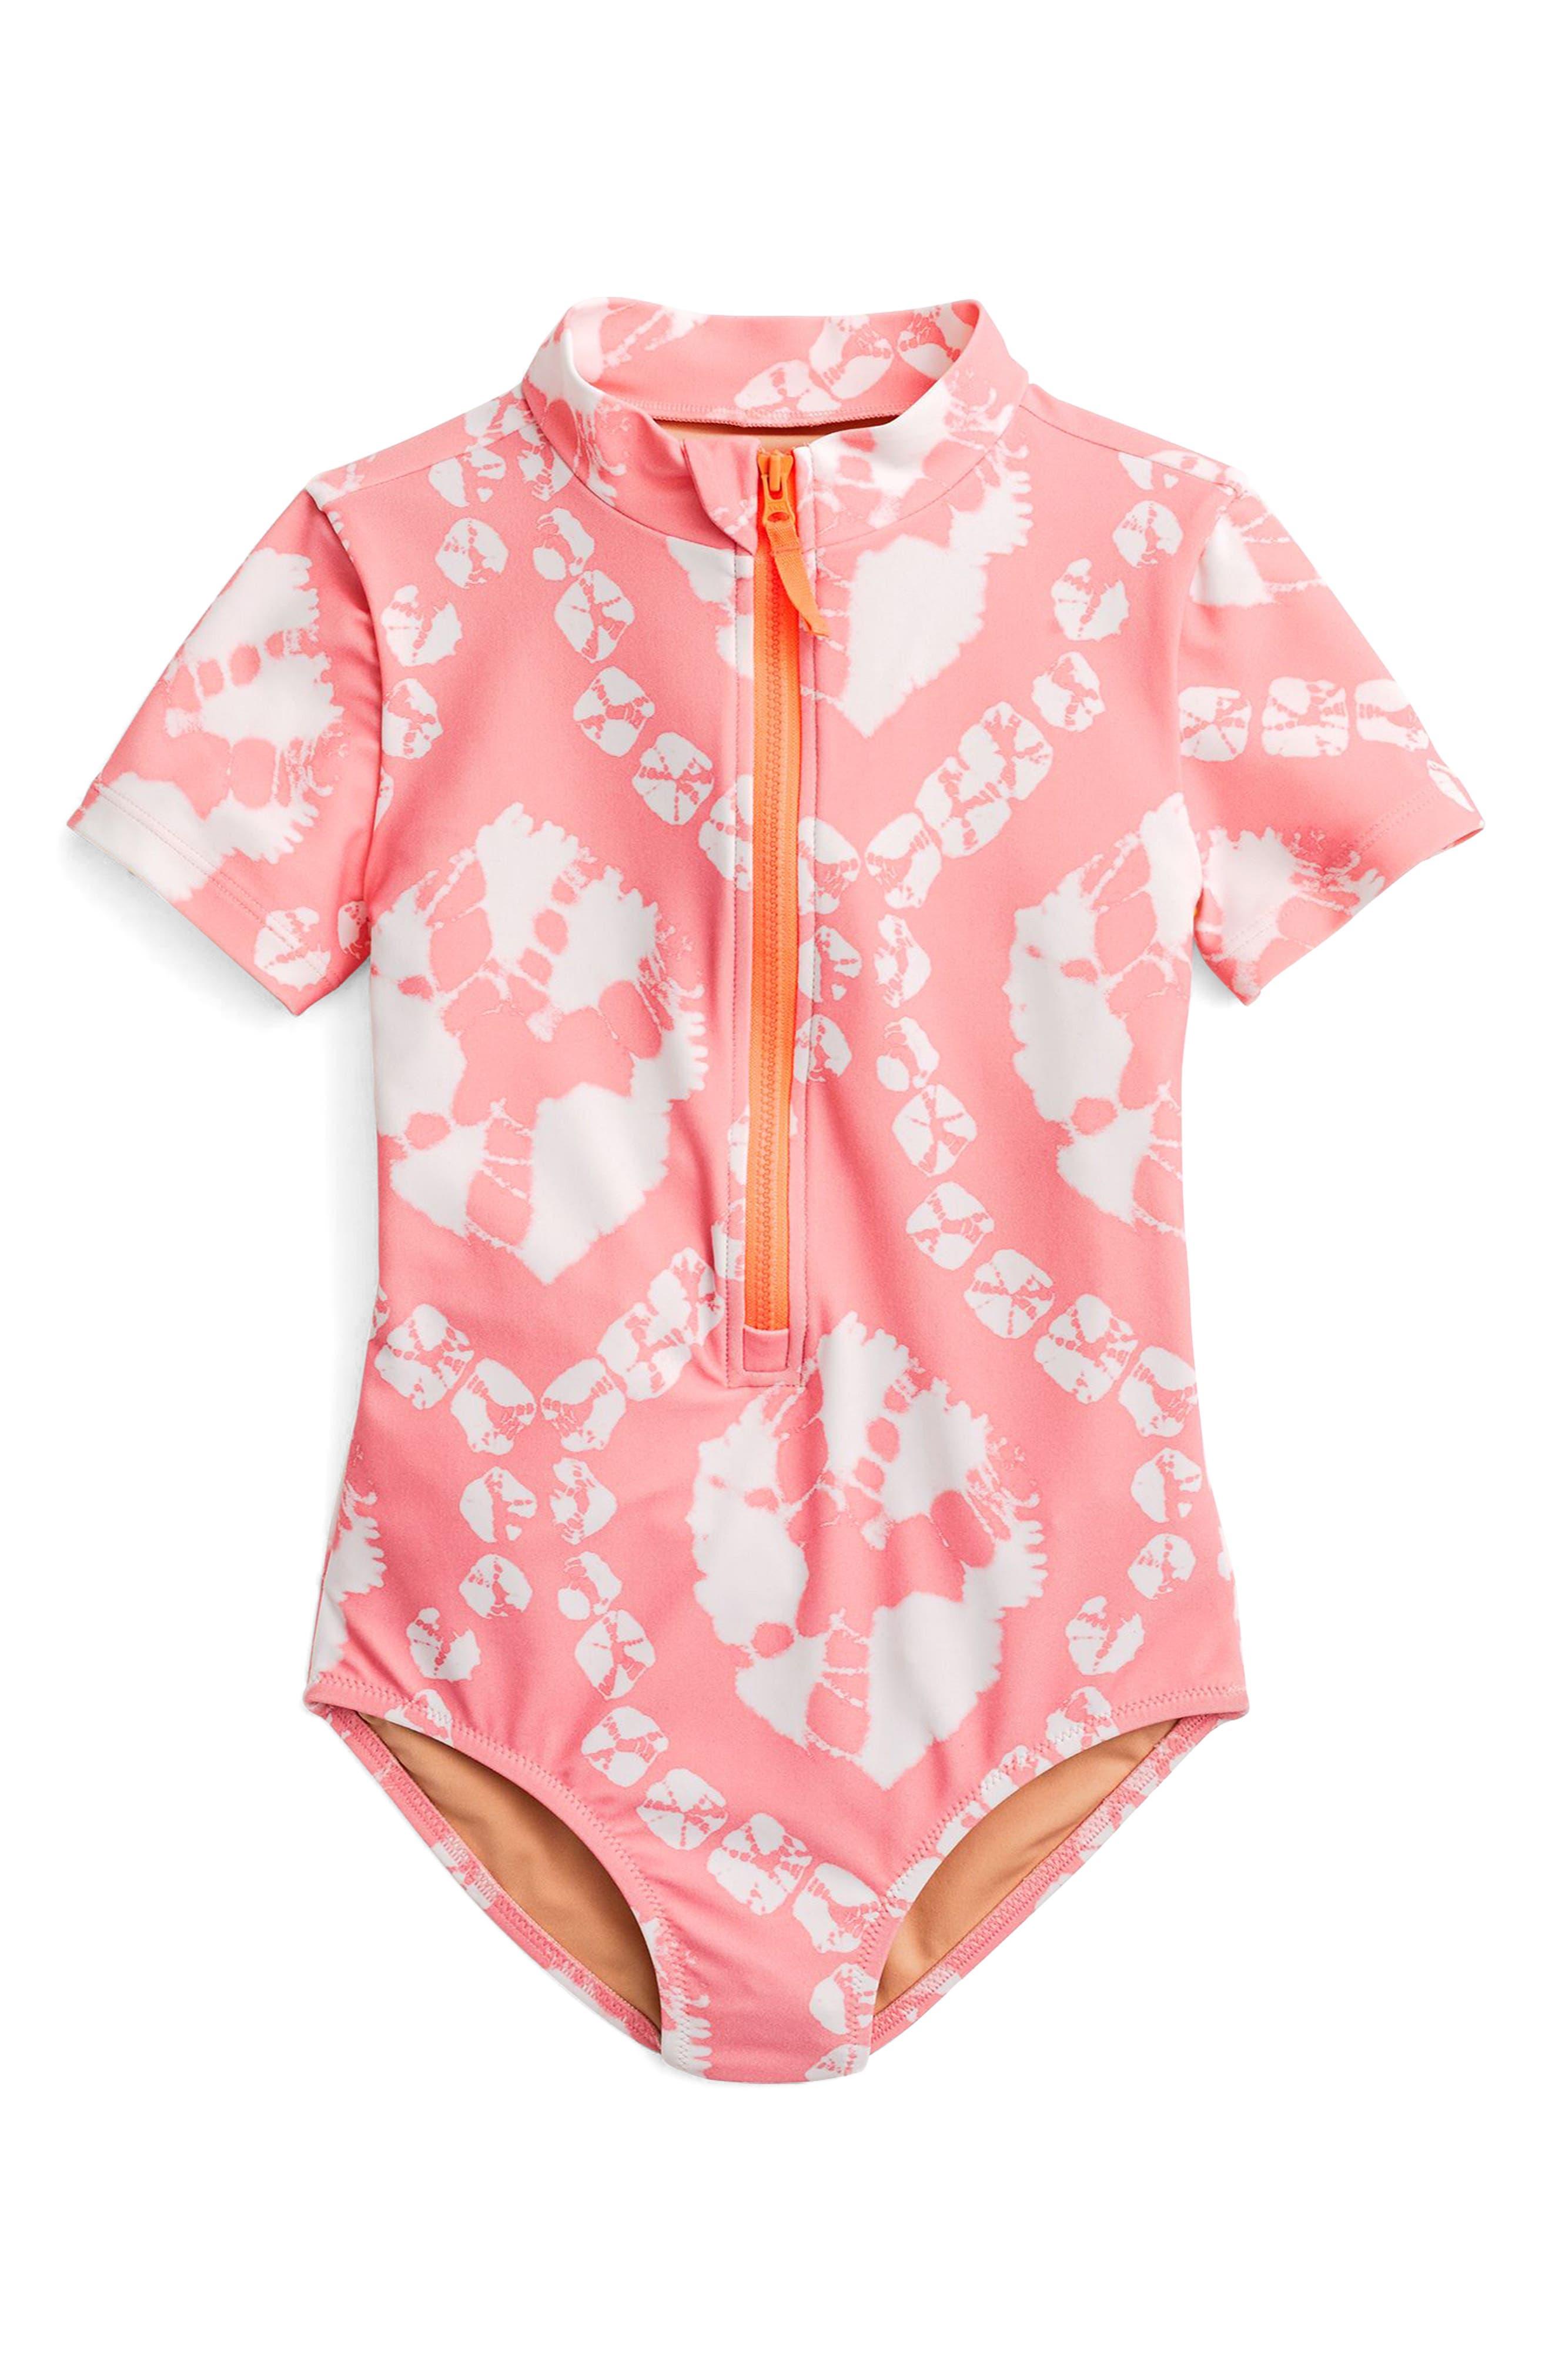 Tie Dye One-Piece Rashguard Swimsuit,                             Main thumbnail 1, color,                             Pink Orange Multi Ka3139